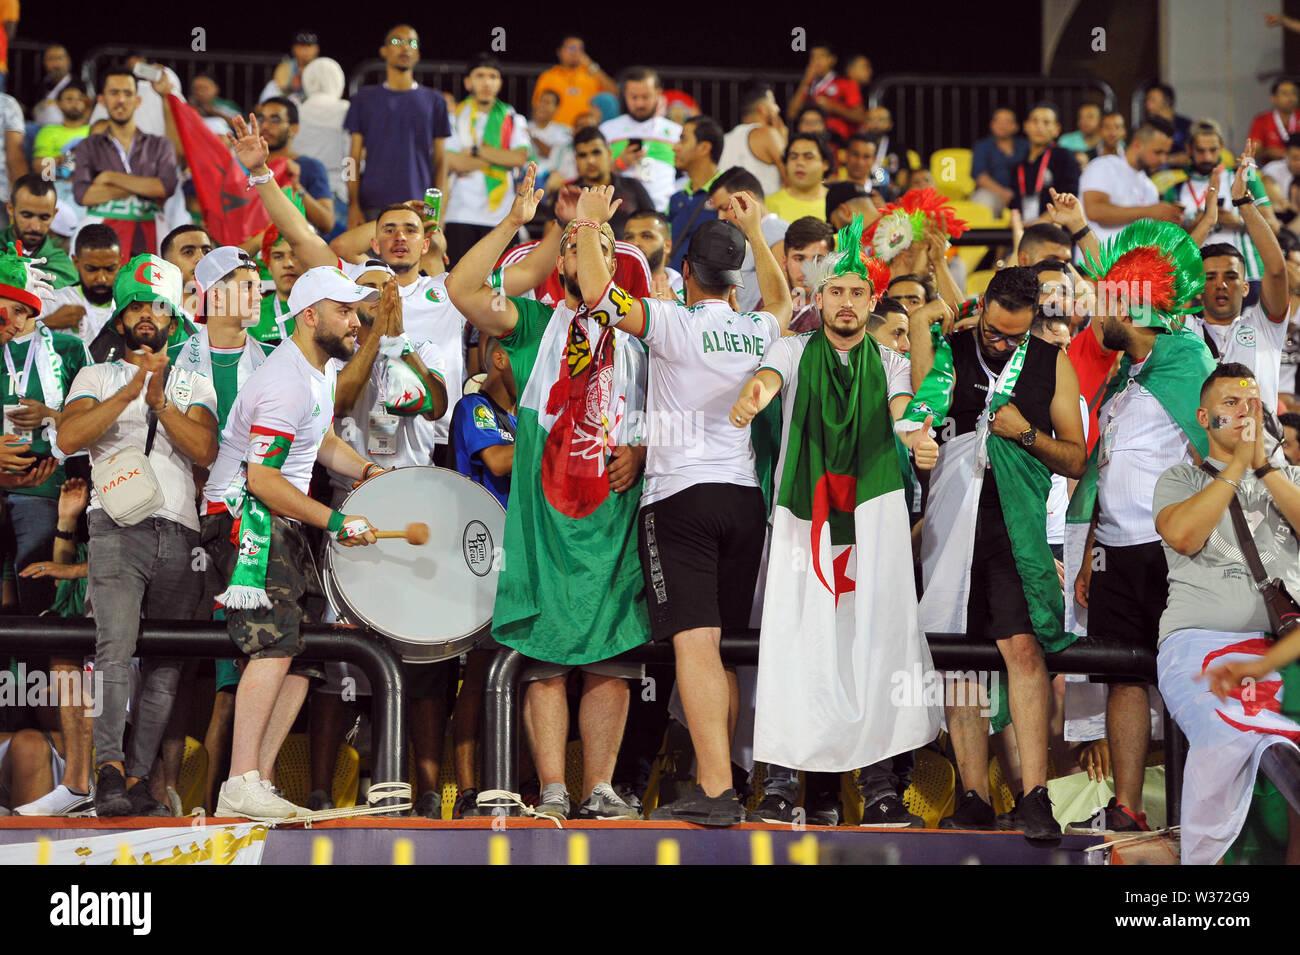 Cairo, Egypt. 1st July, 2019. Algerian fans during during the match Tanzania vs Algeria.Total Africa Cup of Nations Egypt 2019 at the Al Salam stadium of Cairo.photo: Chokri Mahjoub Credit: Chokri Mahjoub/ZUMA Wire/Alamy Live News - Stock Image